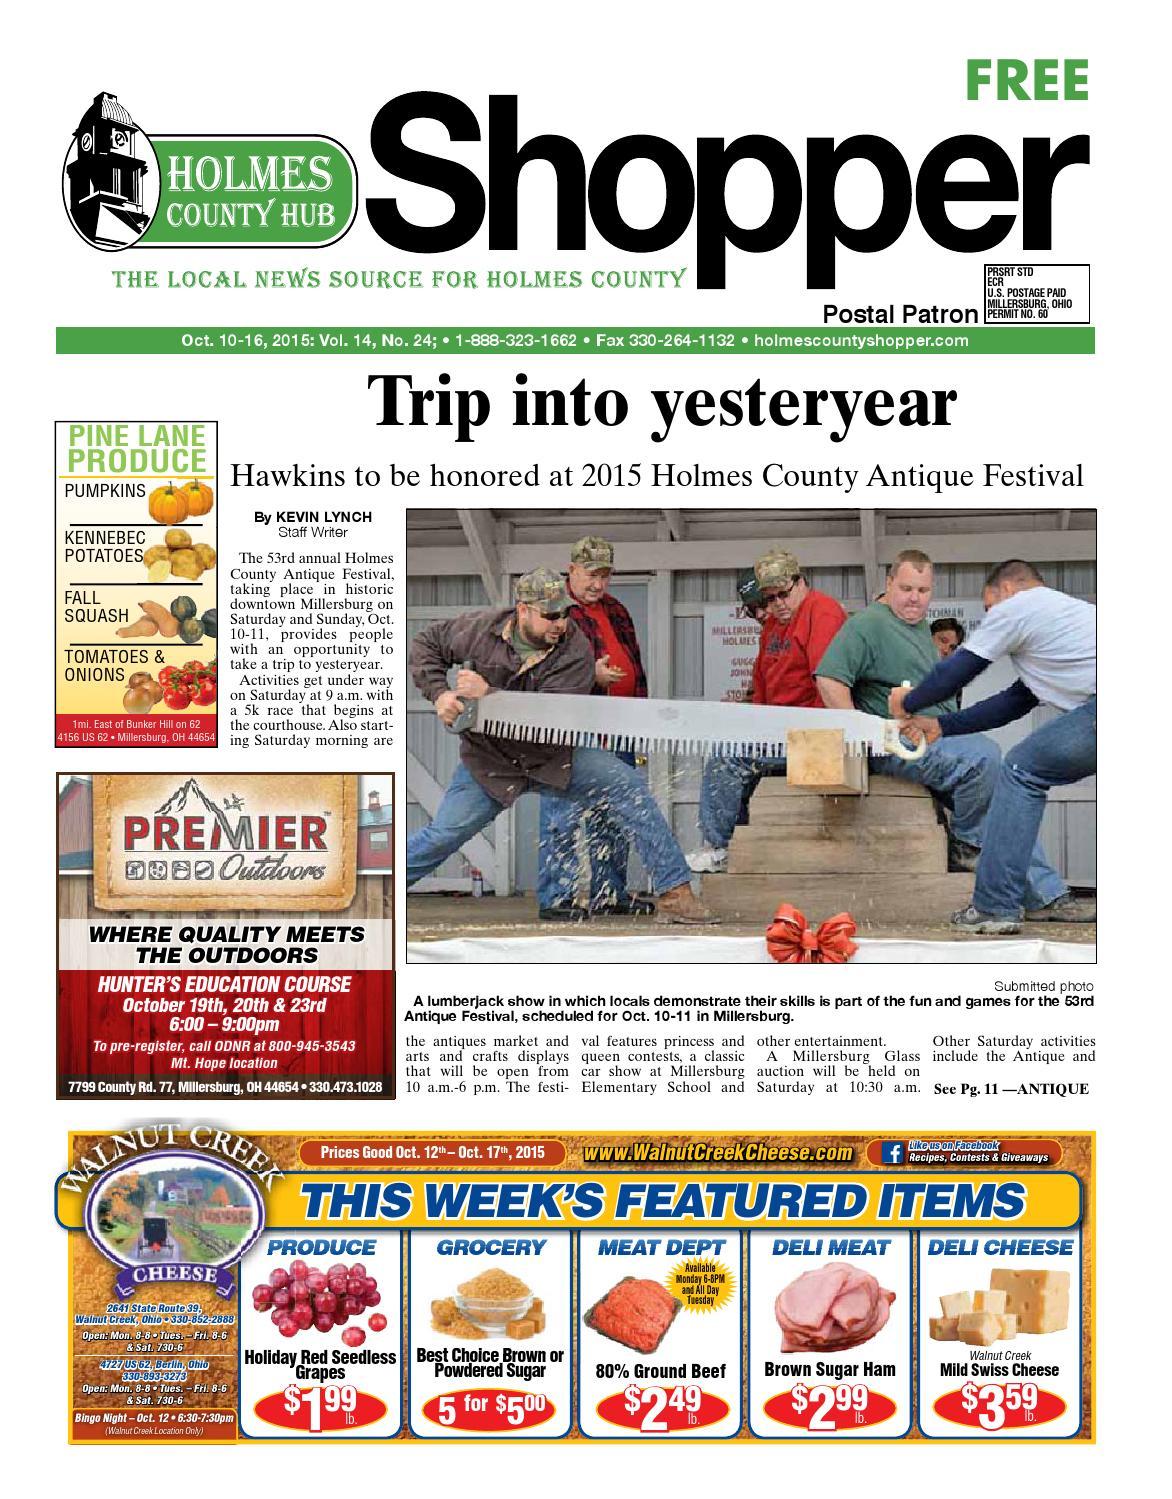 a2acee5fd Holmes County Hub Shopper, Oct. 10, 2015 by GateHouse Media NEO - issuu